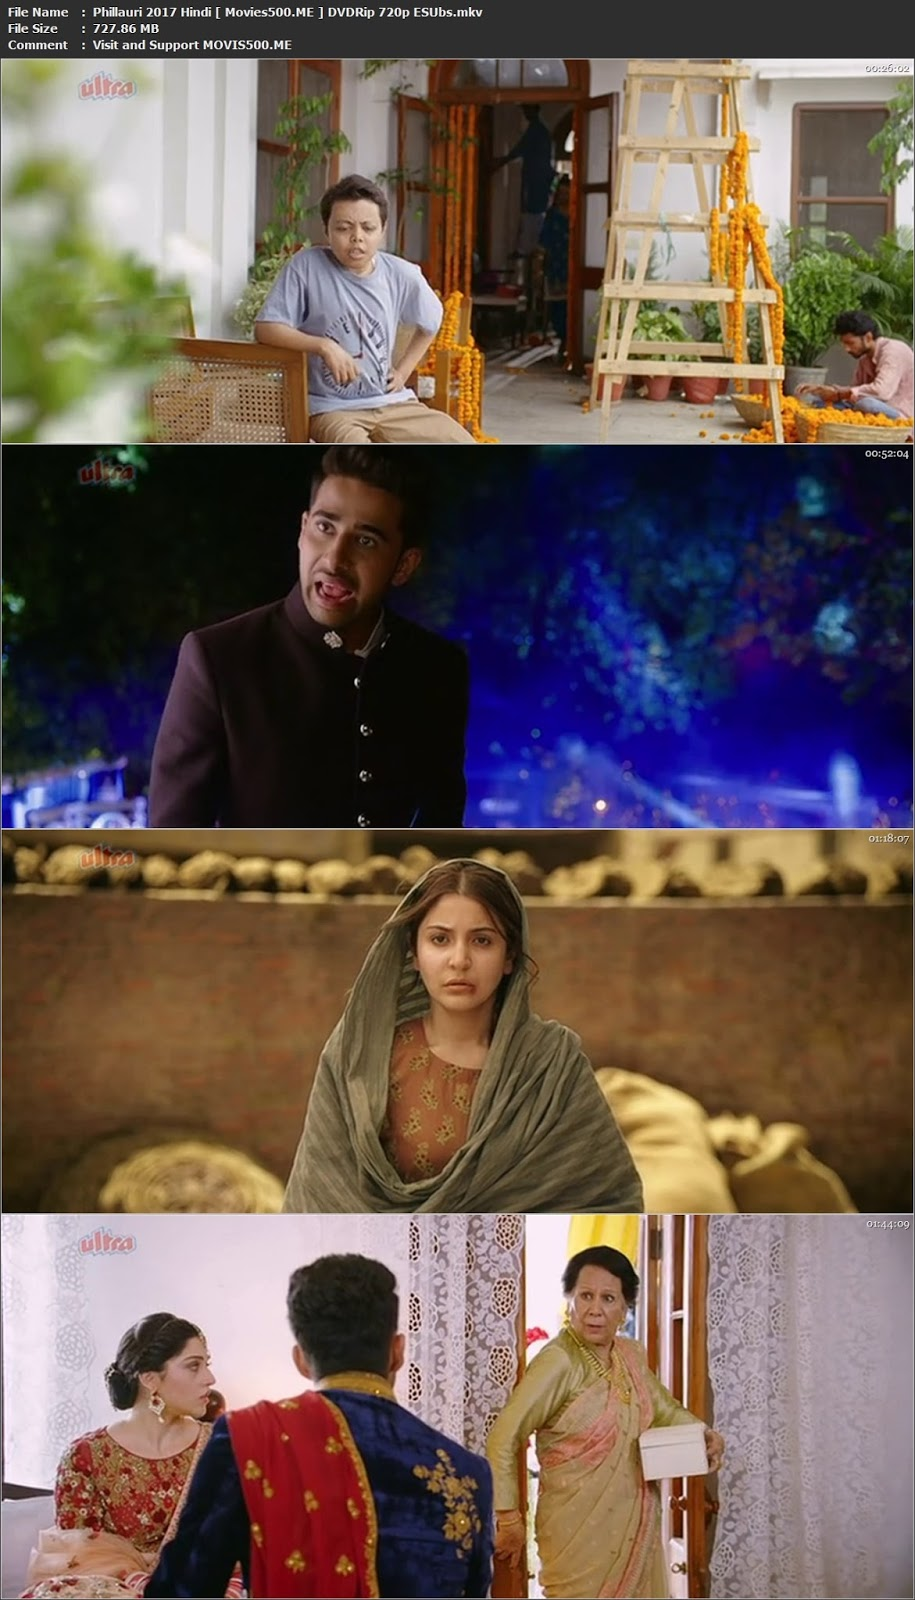 Phillauri 2017 Hindi Full Movie DVDRip 720p ESUbs at tokenguy.com